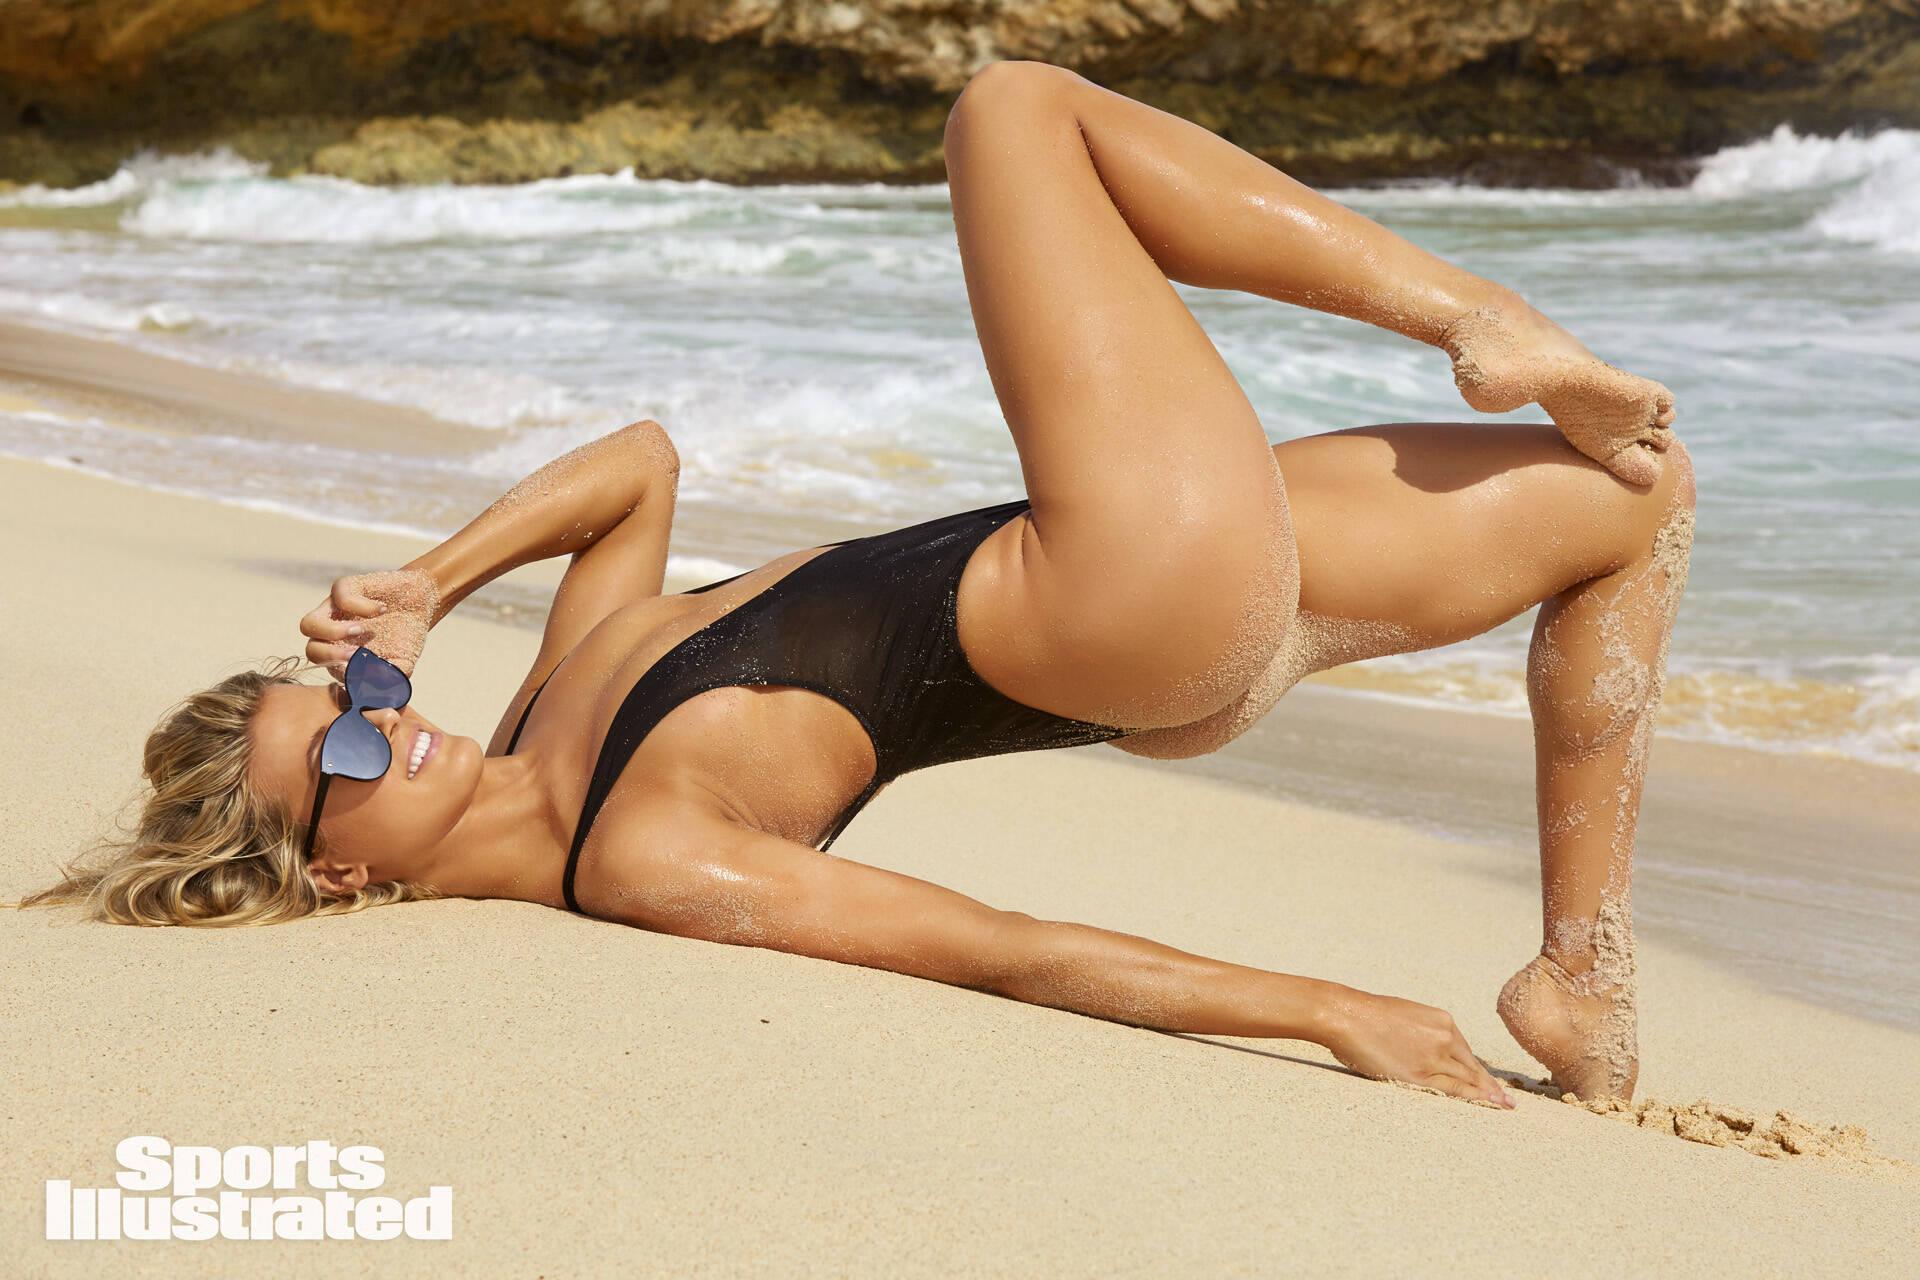 Ensaio da tenista canadense Genie Bouchard para revista Sports Illustrated Swimsuit . Foto: Sports Illustrated